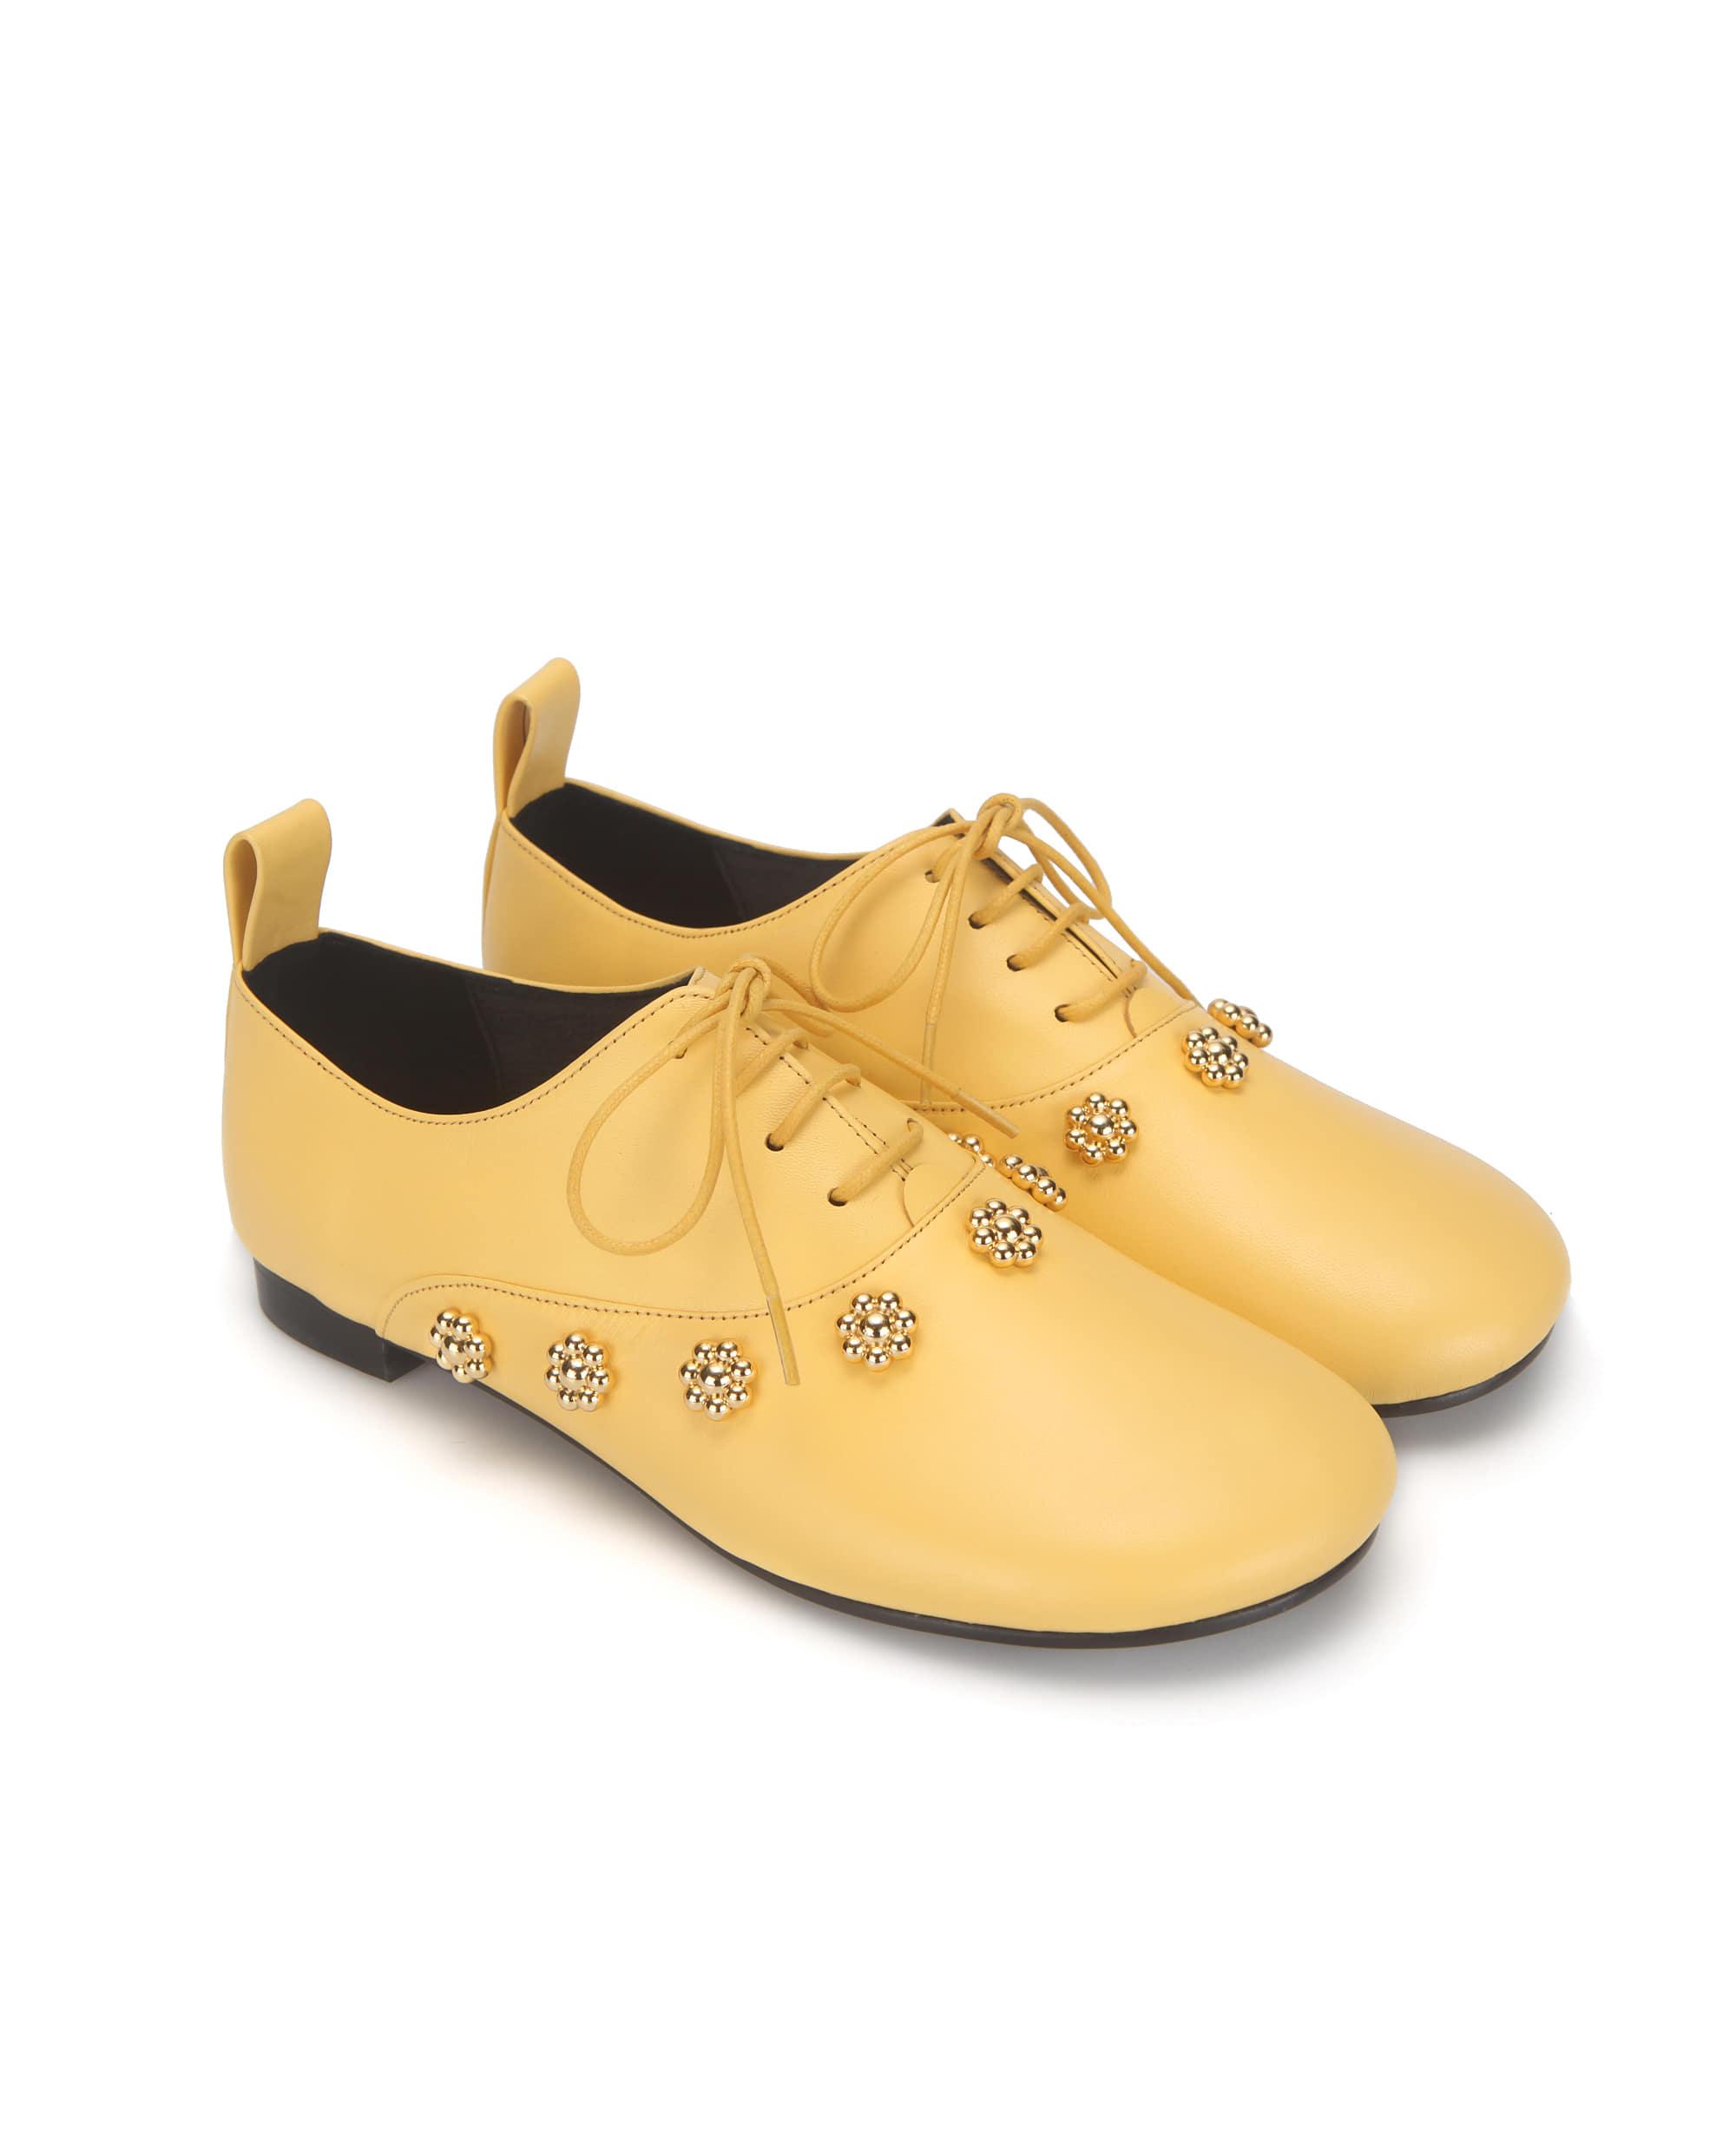 Pebble toe flower oxfords | Yellow